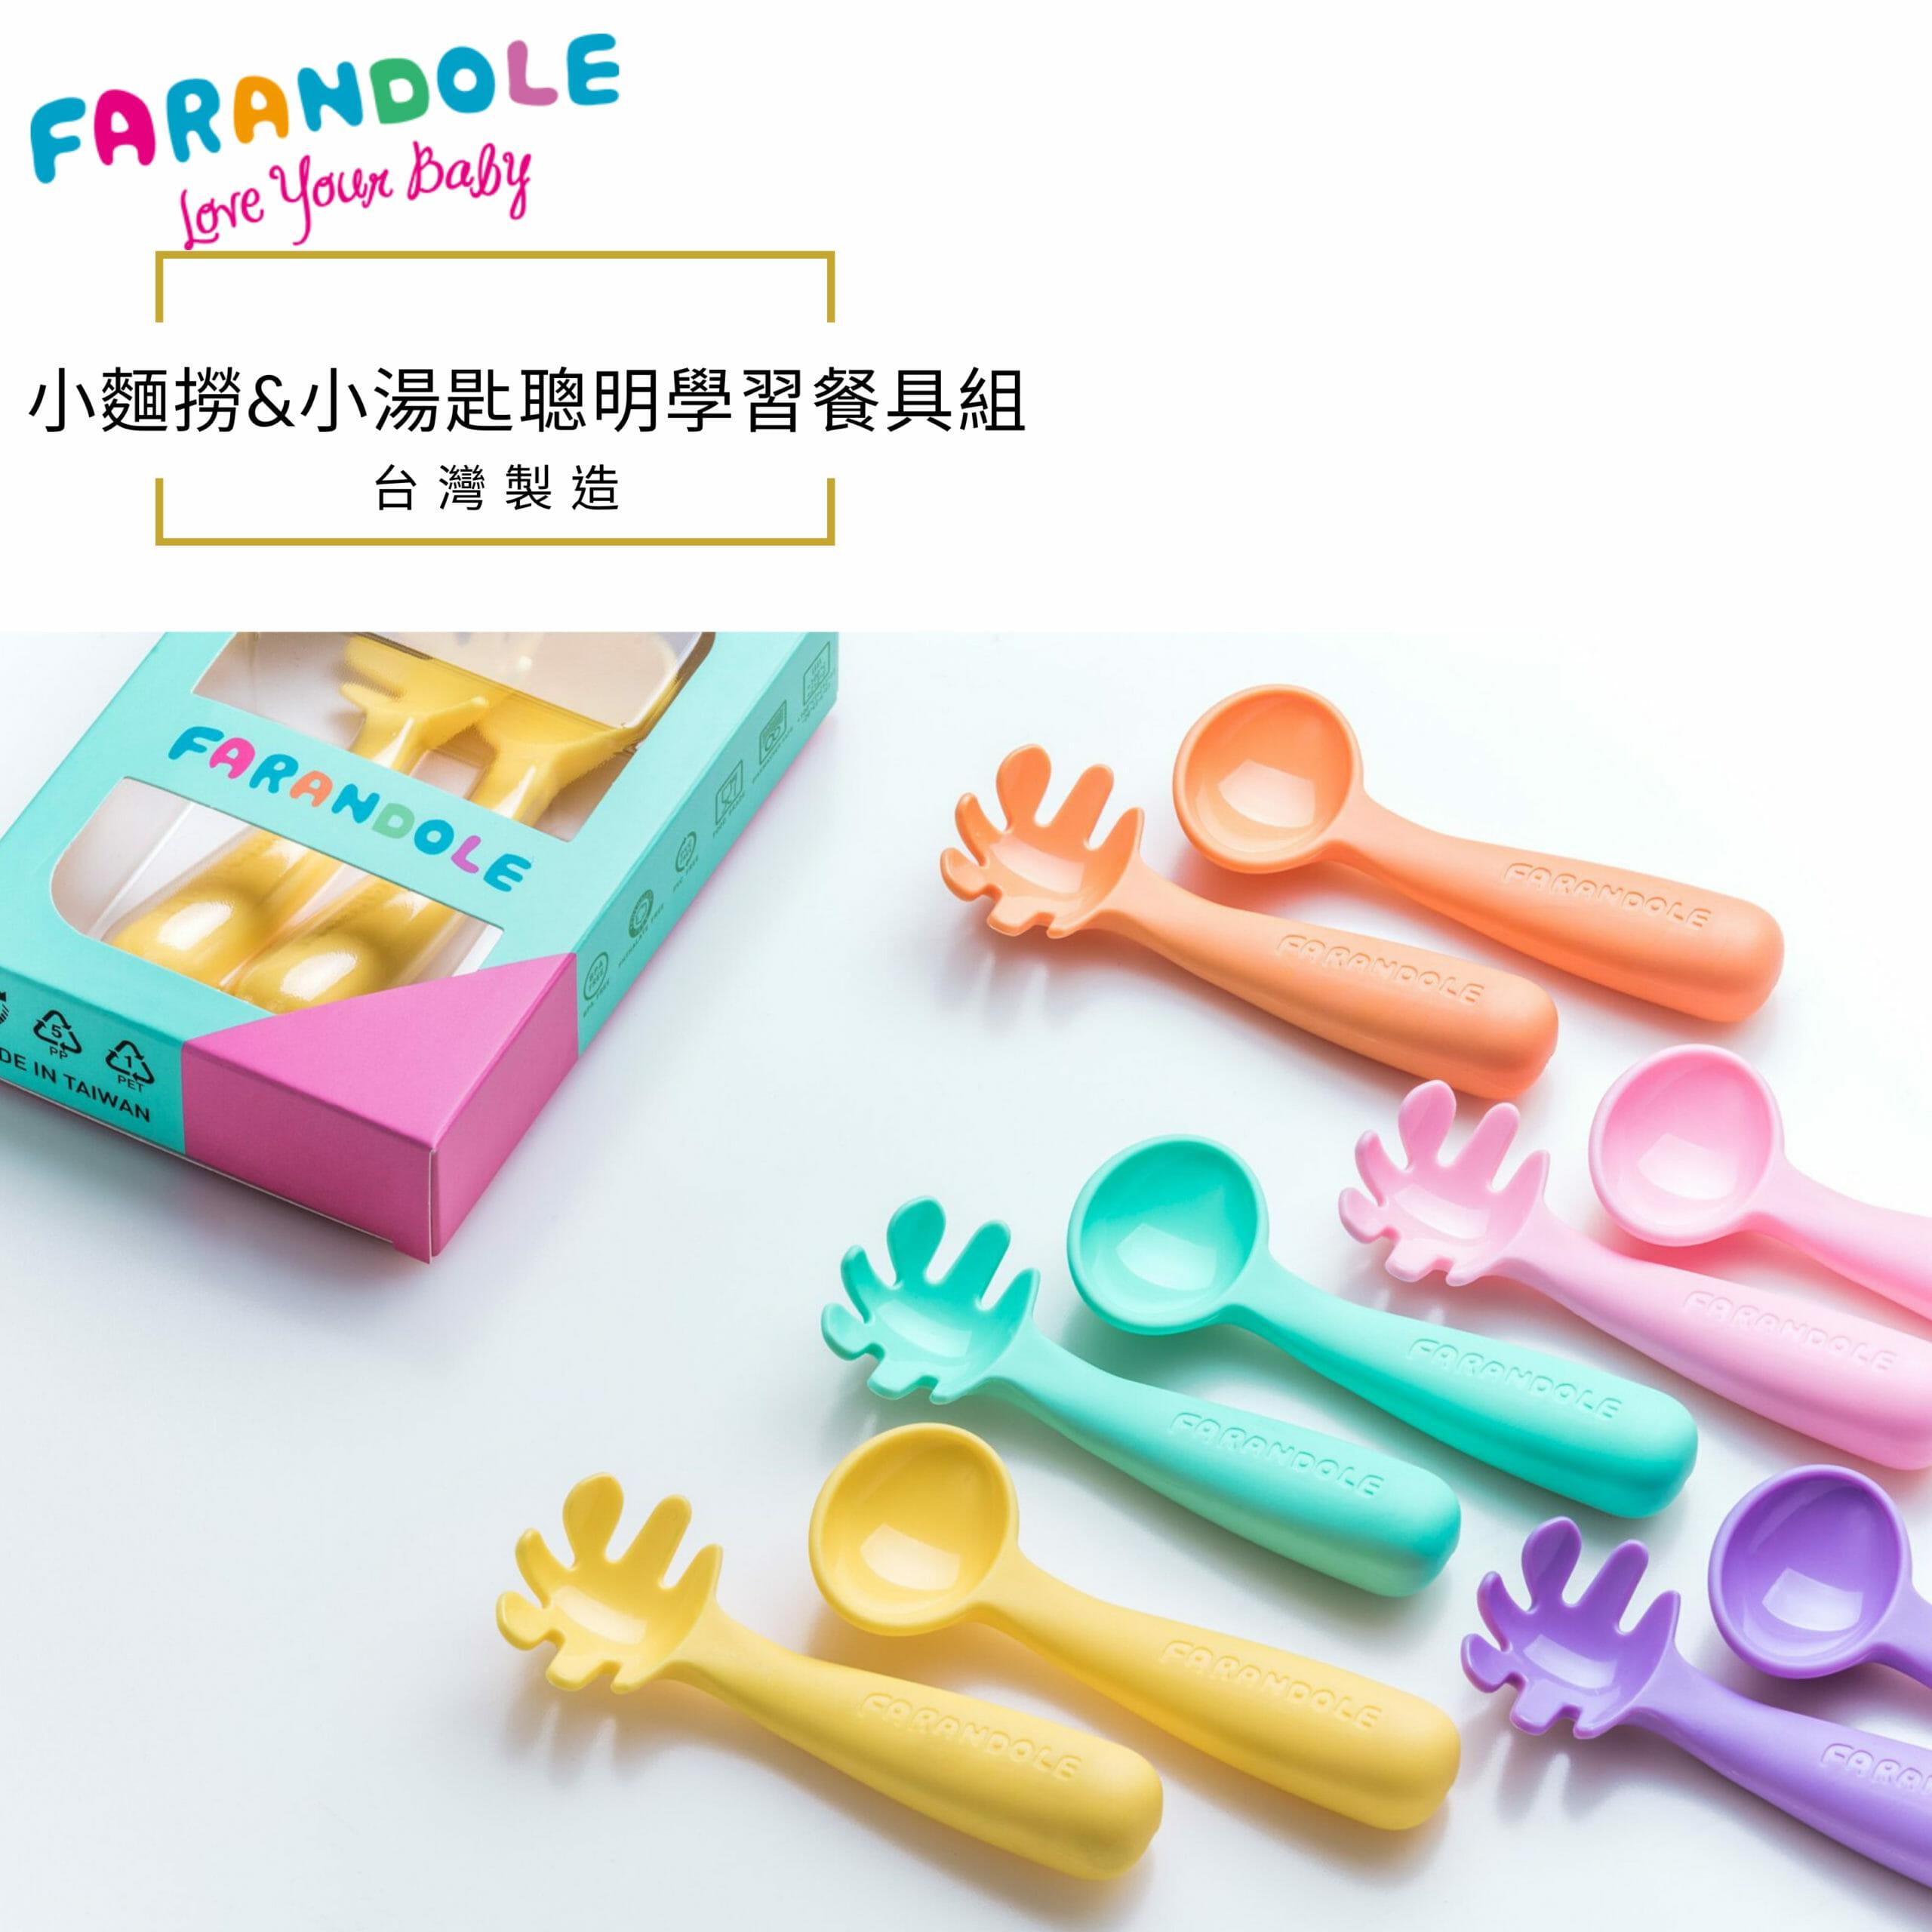 Farandole小麵撈 & 小湯匙聰明學習餐具組 11